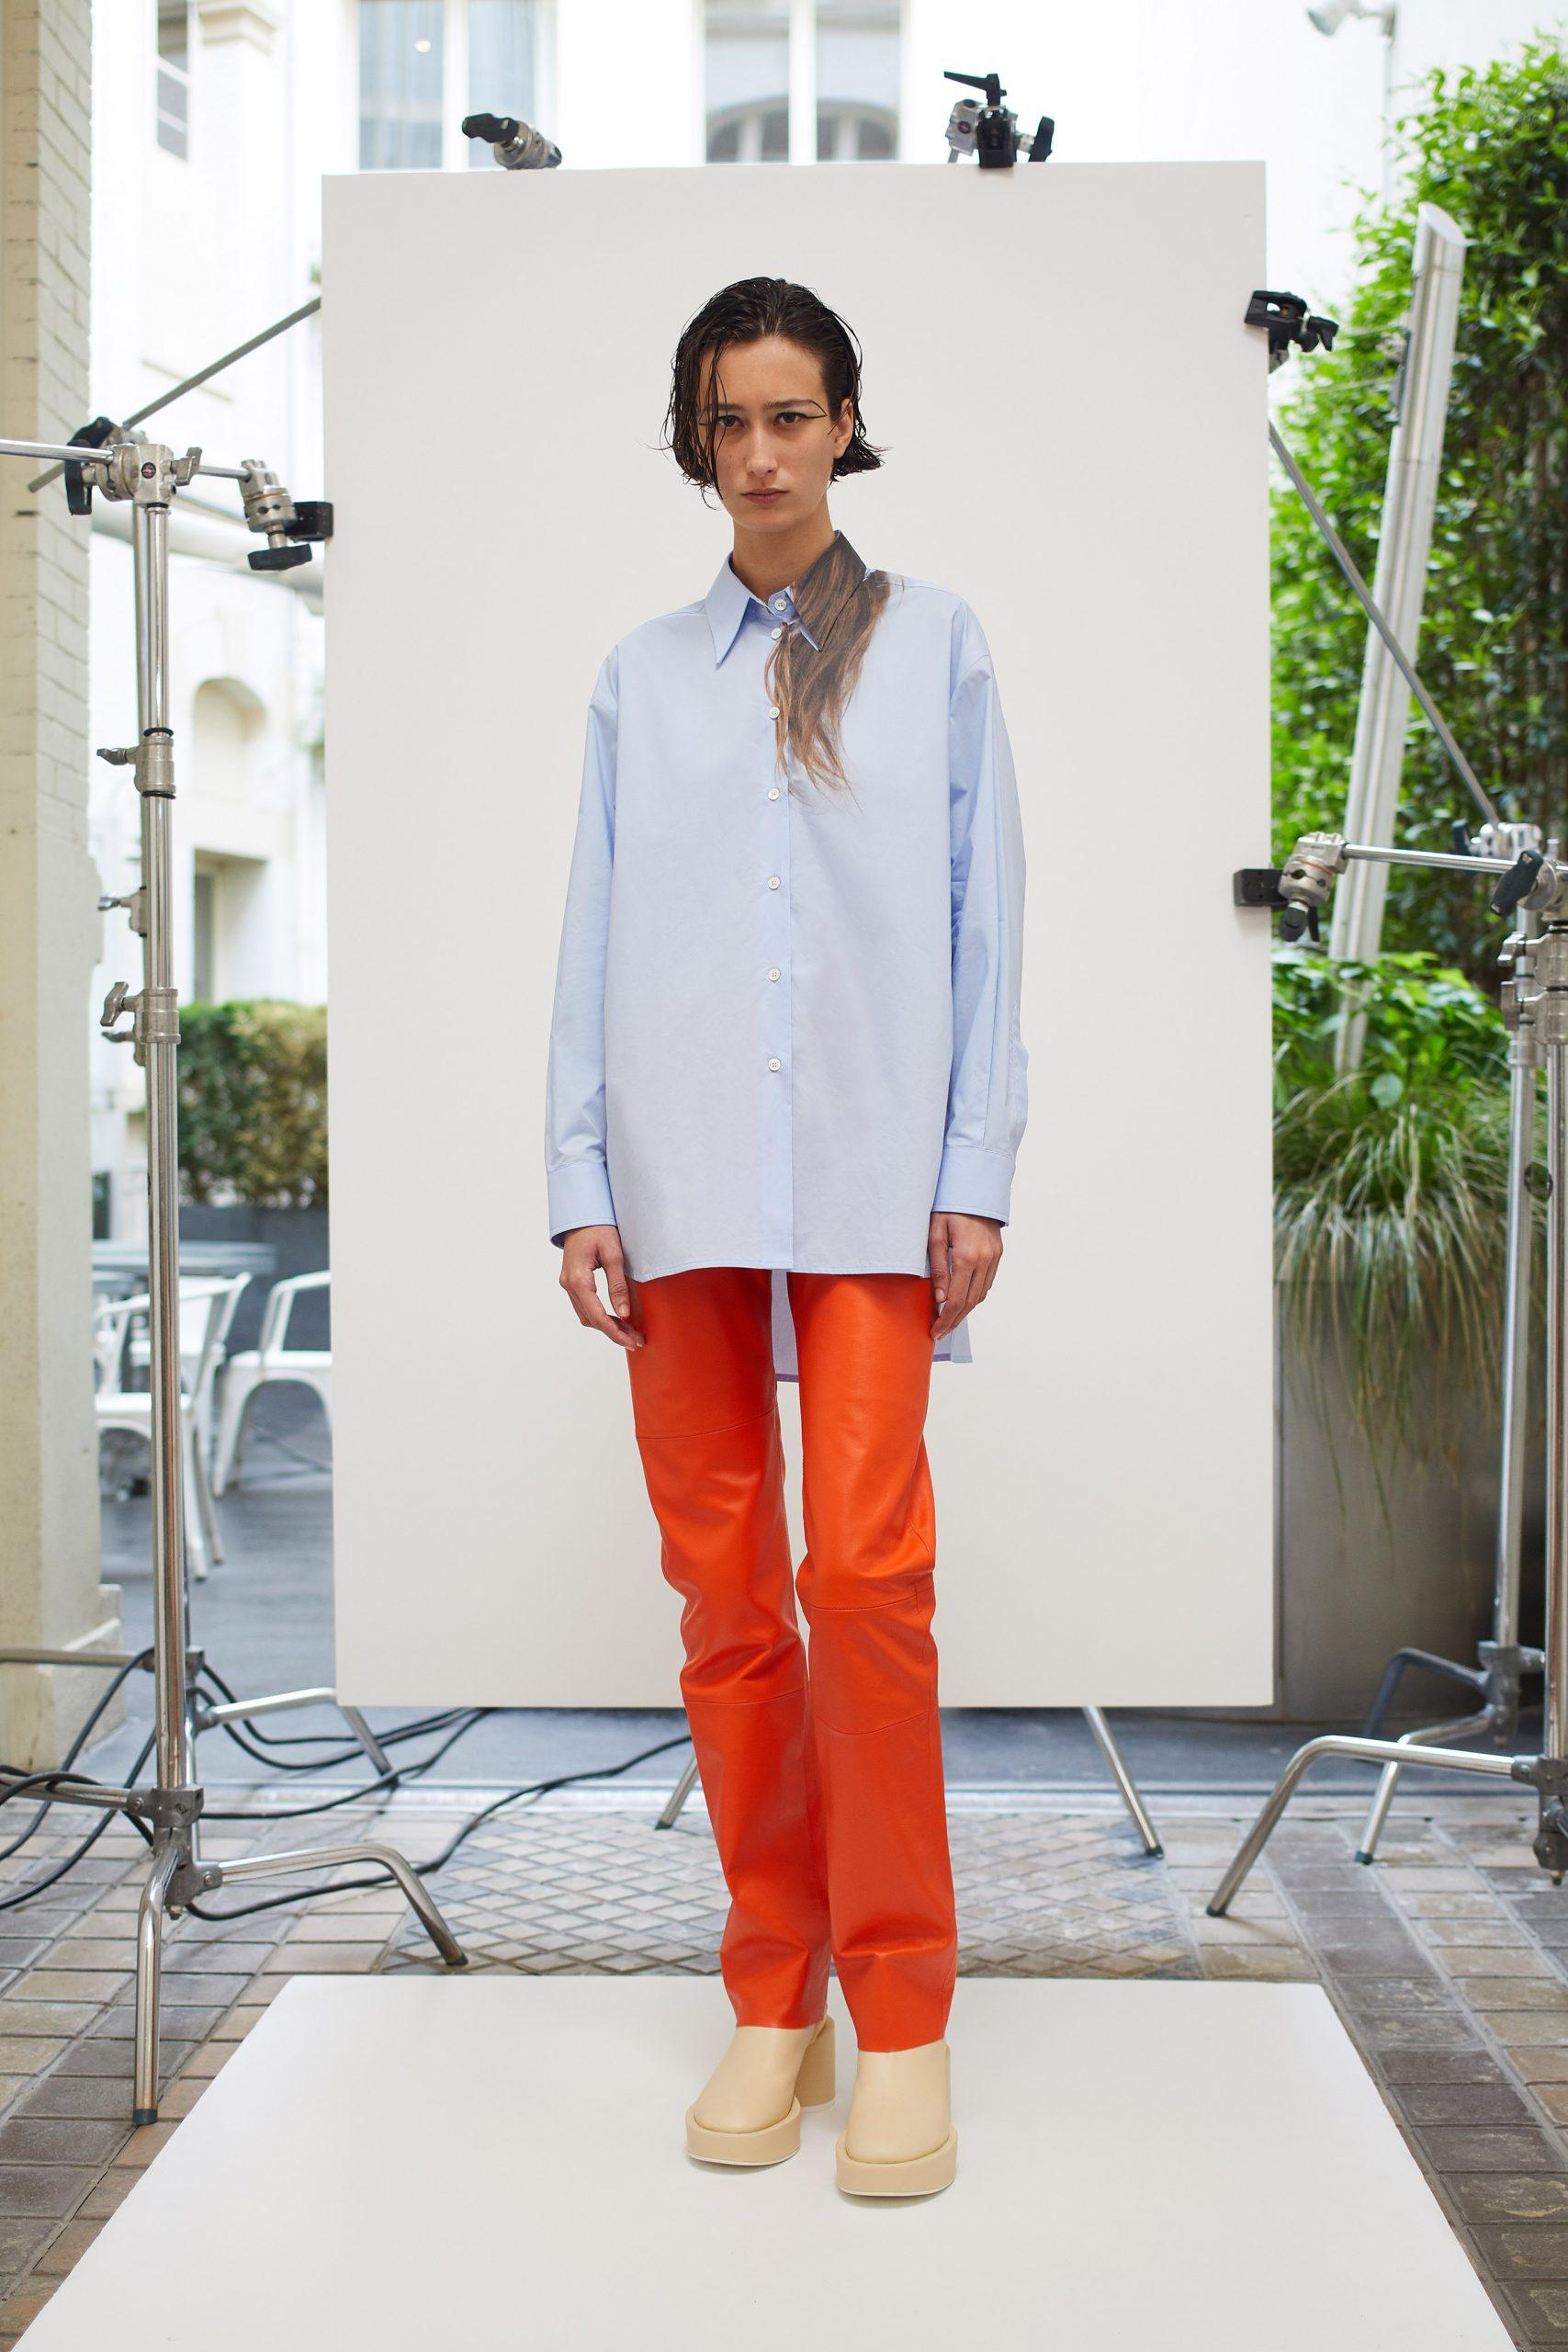 MMsix Maison Margiela Resort 2022 Fashion Show Photos